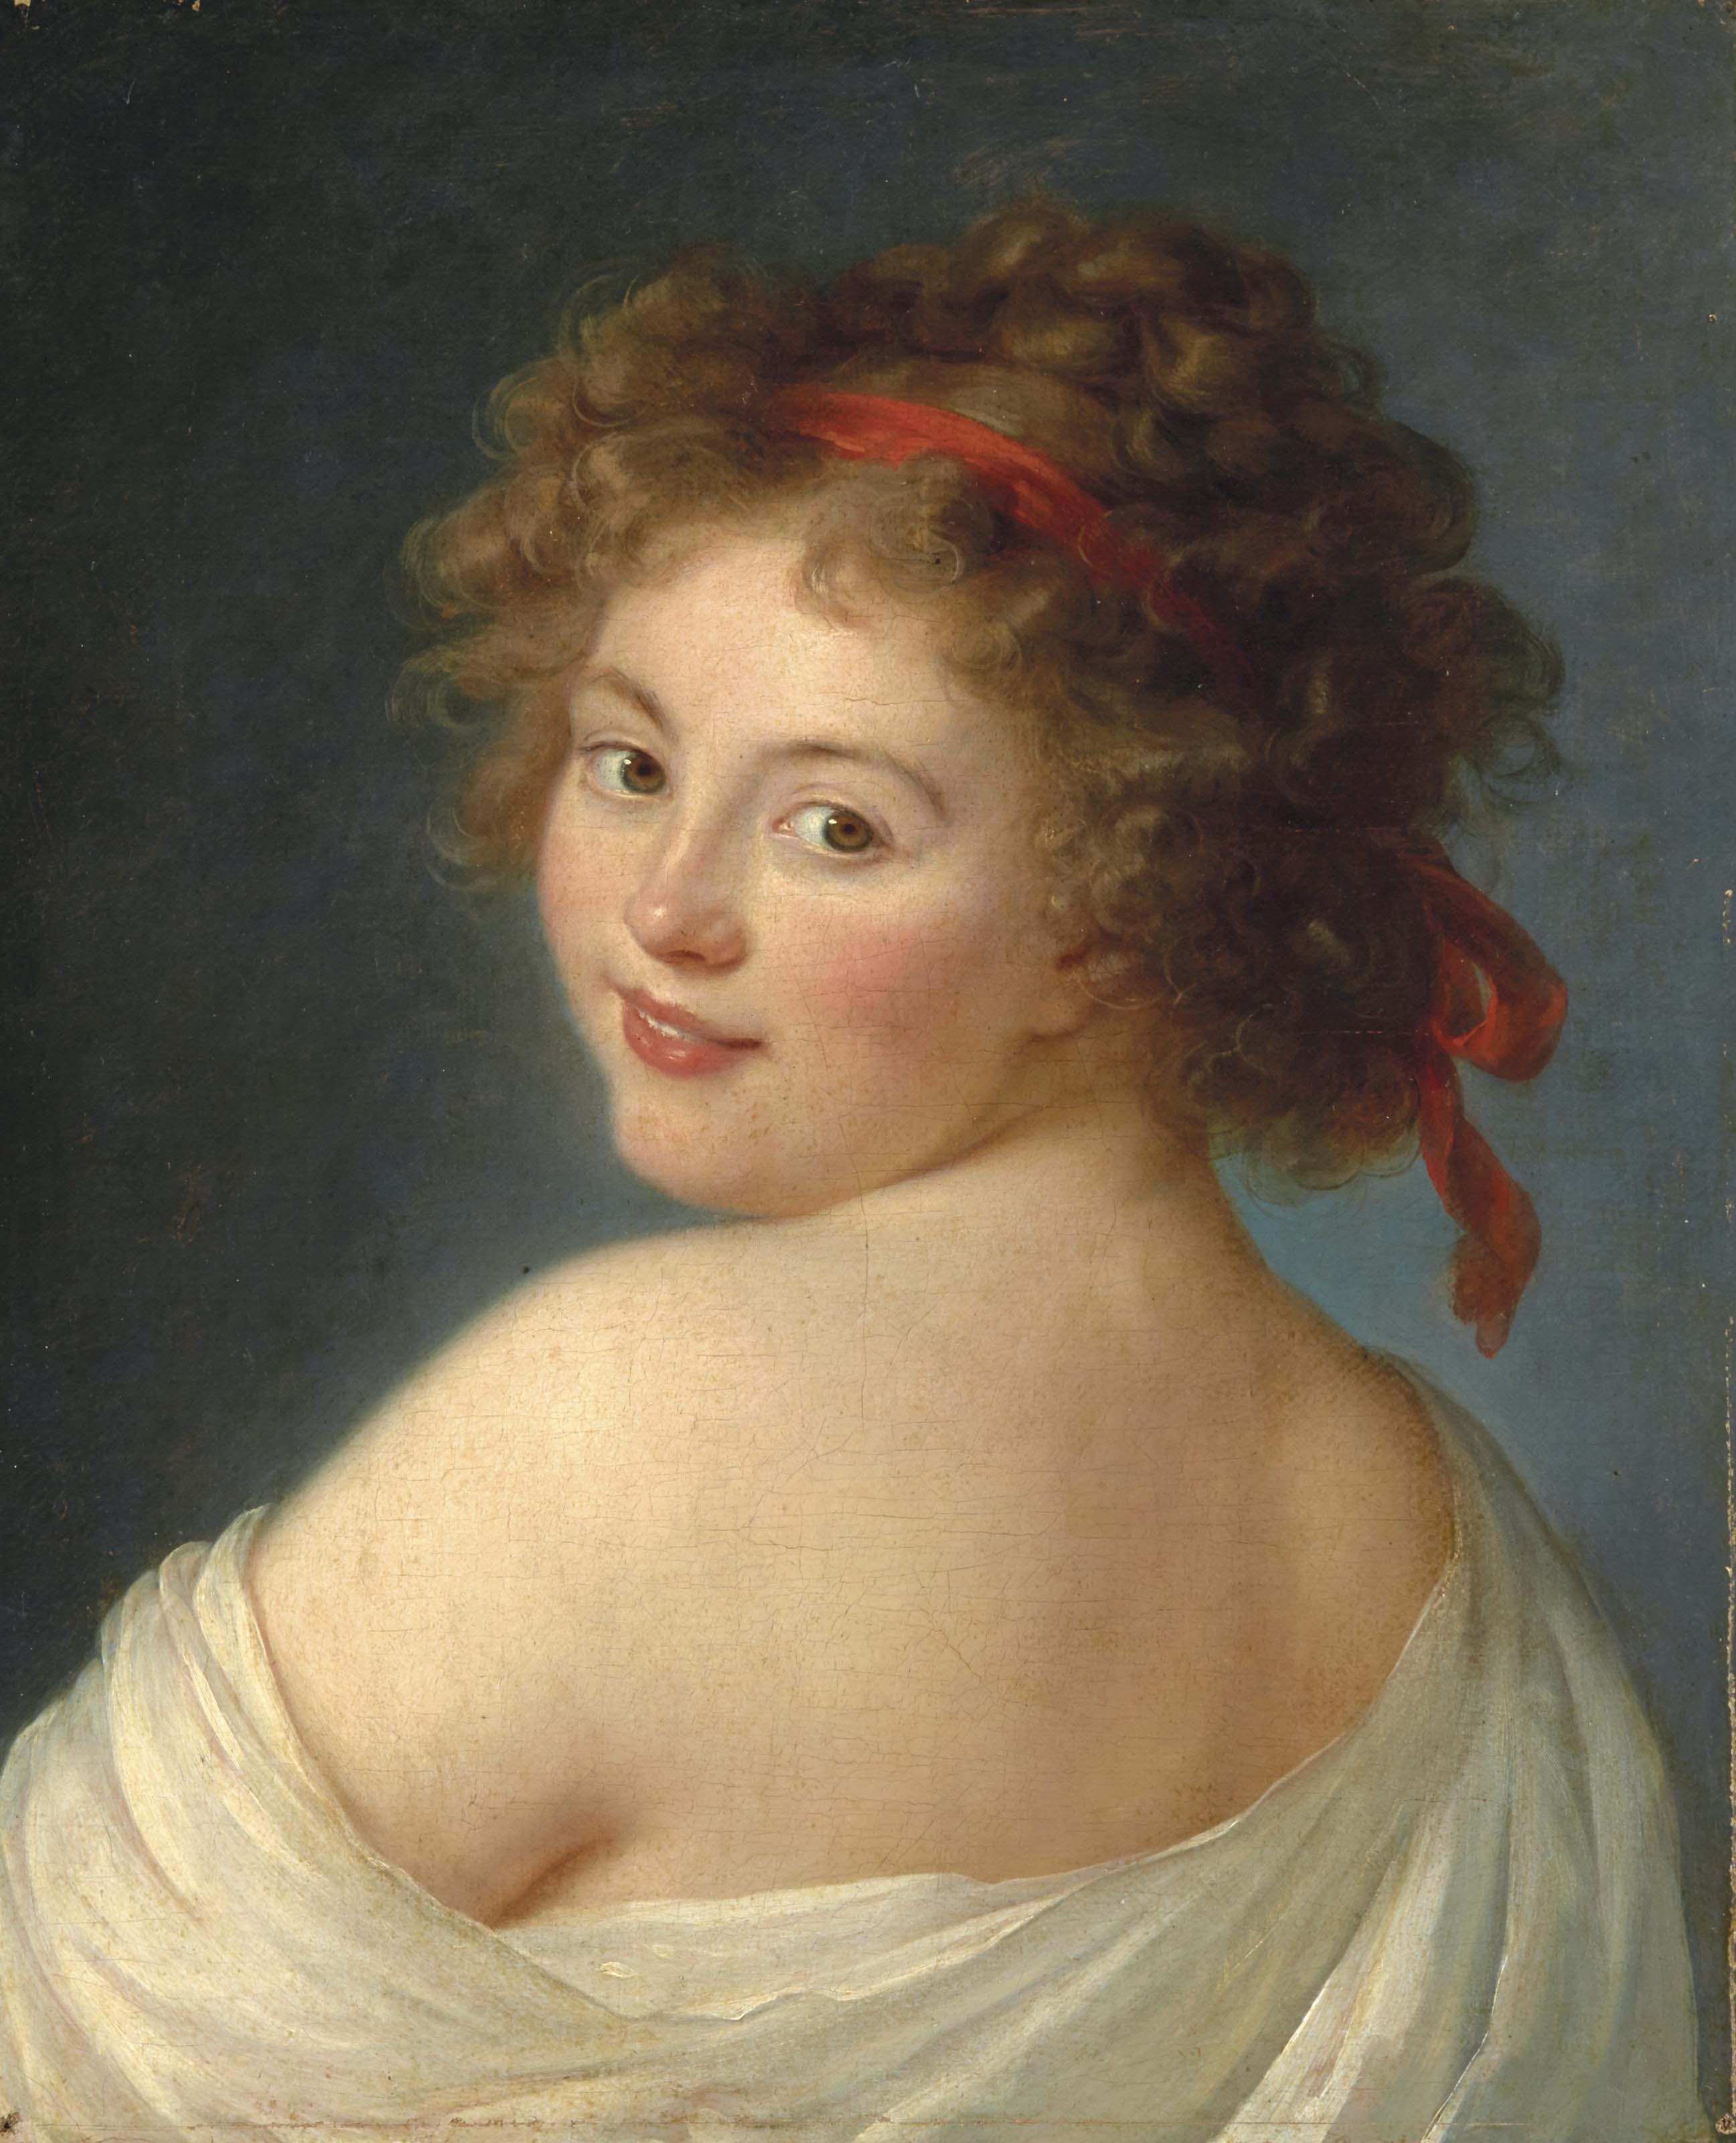 Portrait présumé d'Ekaterina Vassilievna Skavronskaia, comtesse Litta